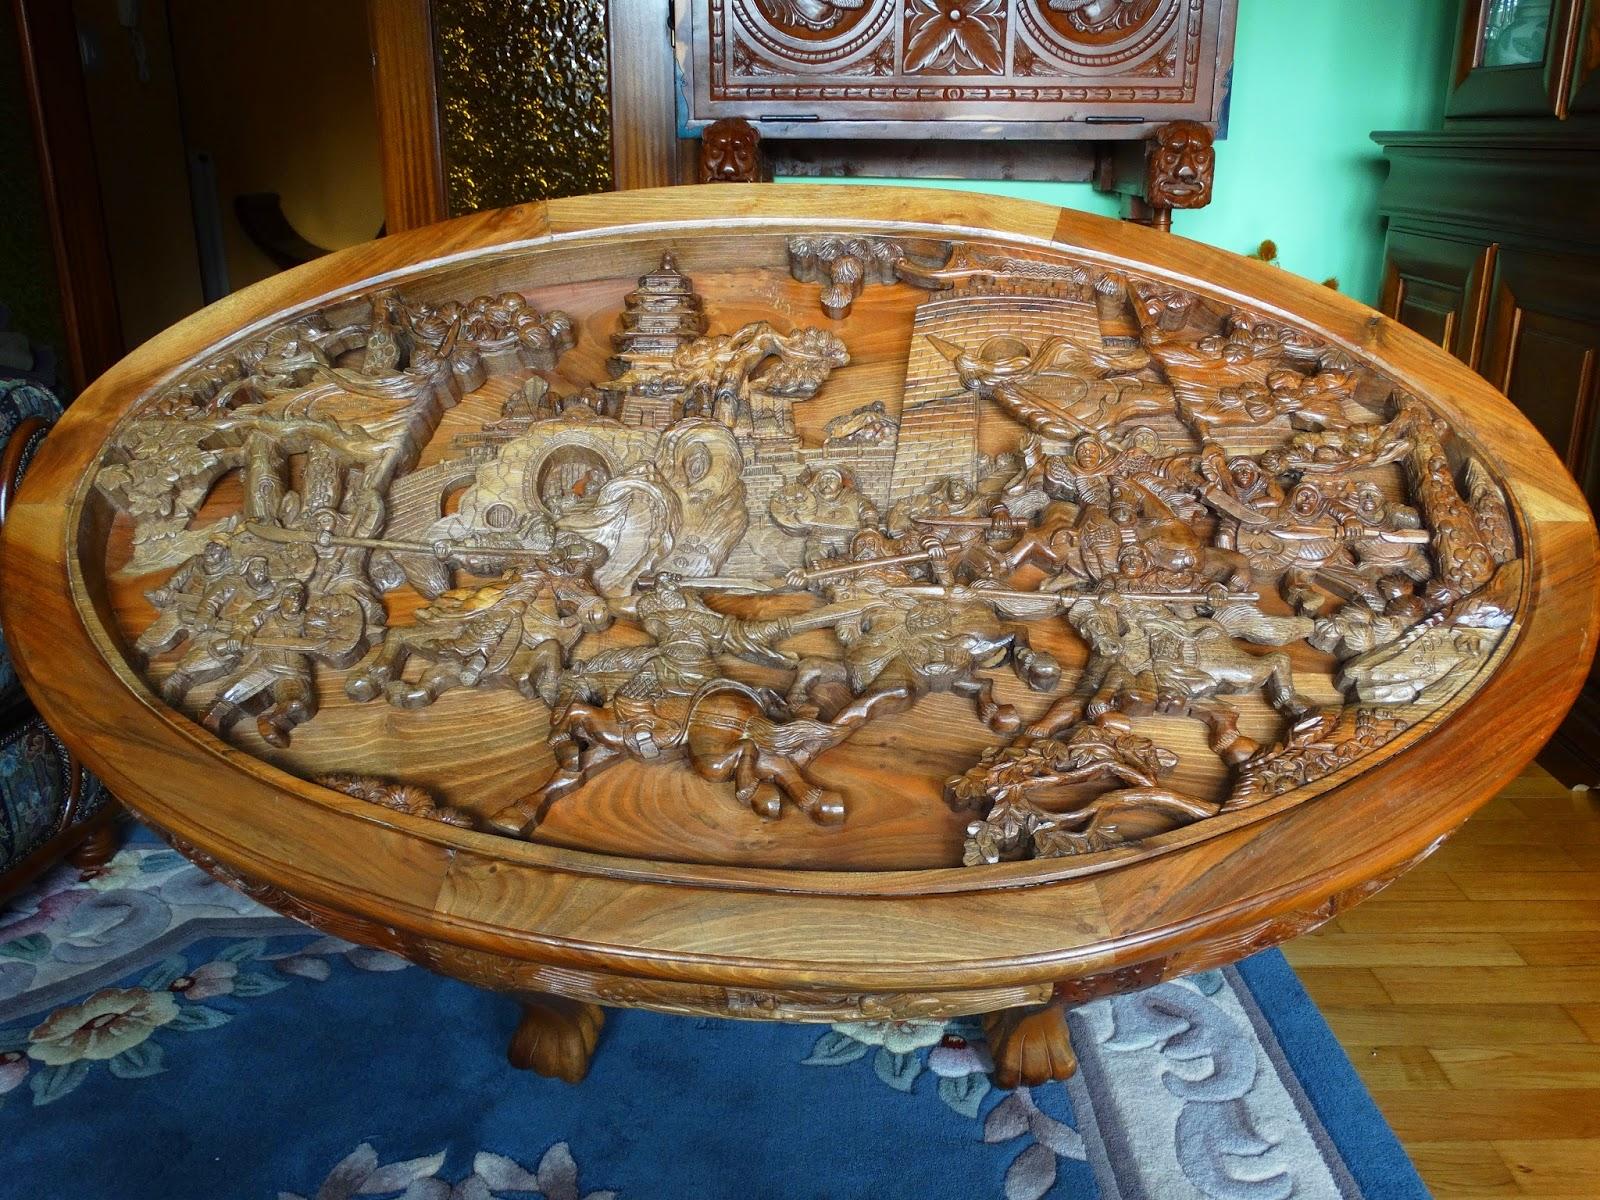 Historia y patrimonio de riosa silvino villanueva silvi for Muebles de tailandia